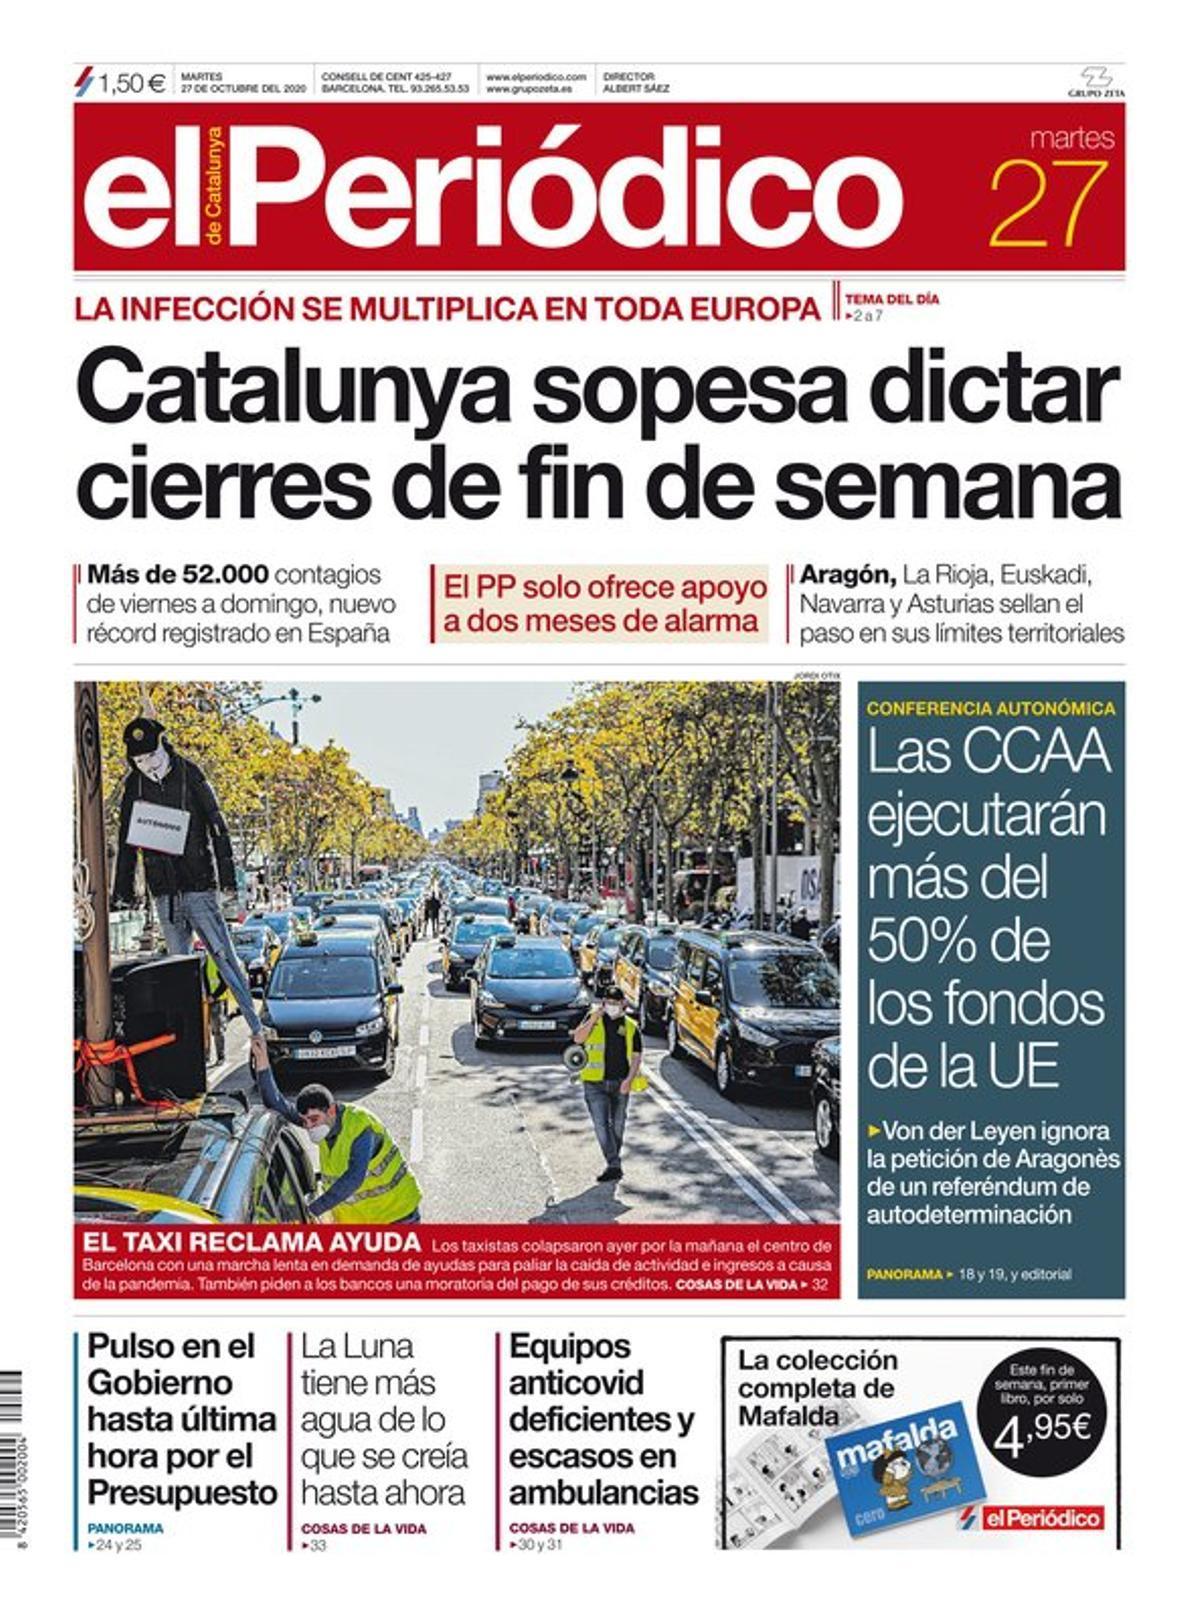 La portada de EL PERIÓDICO del 27 de octubre del 2020.